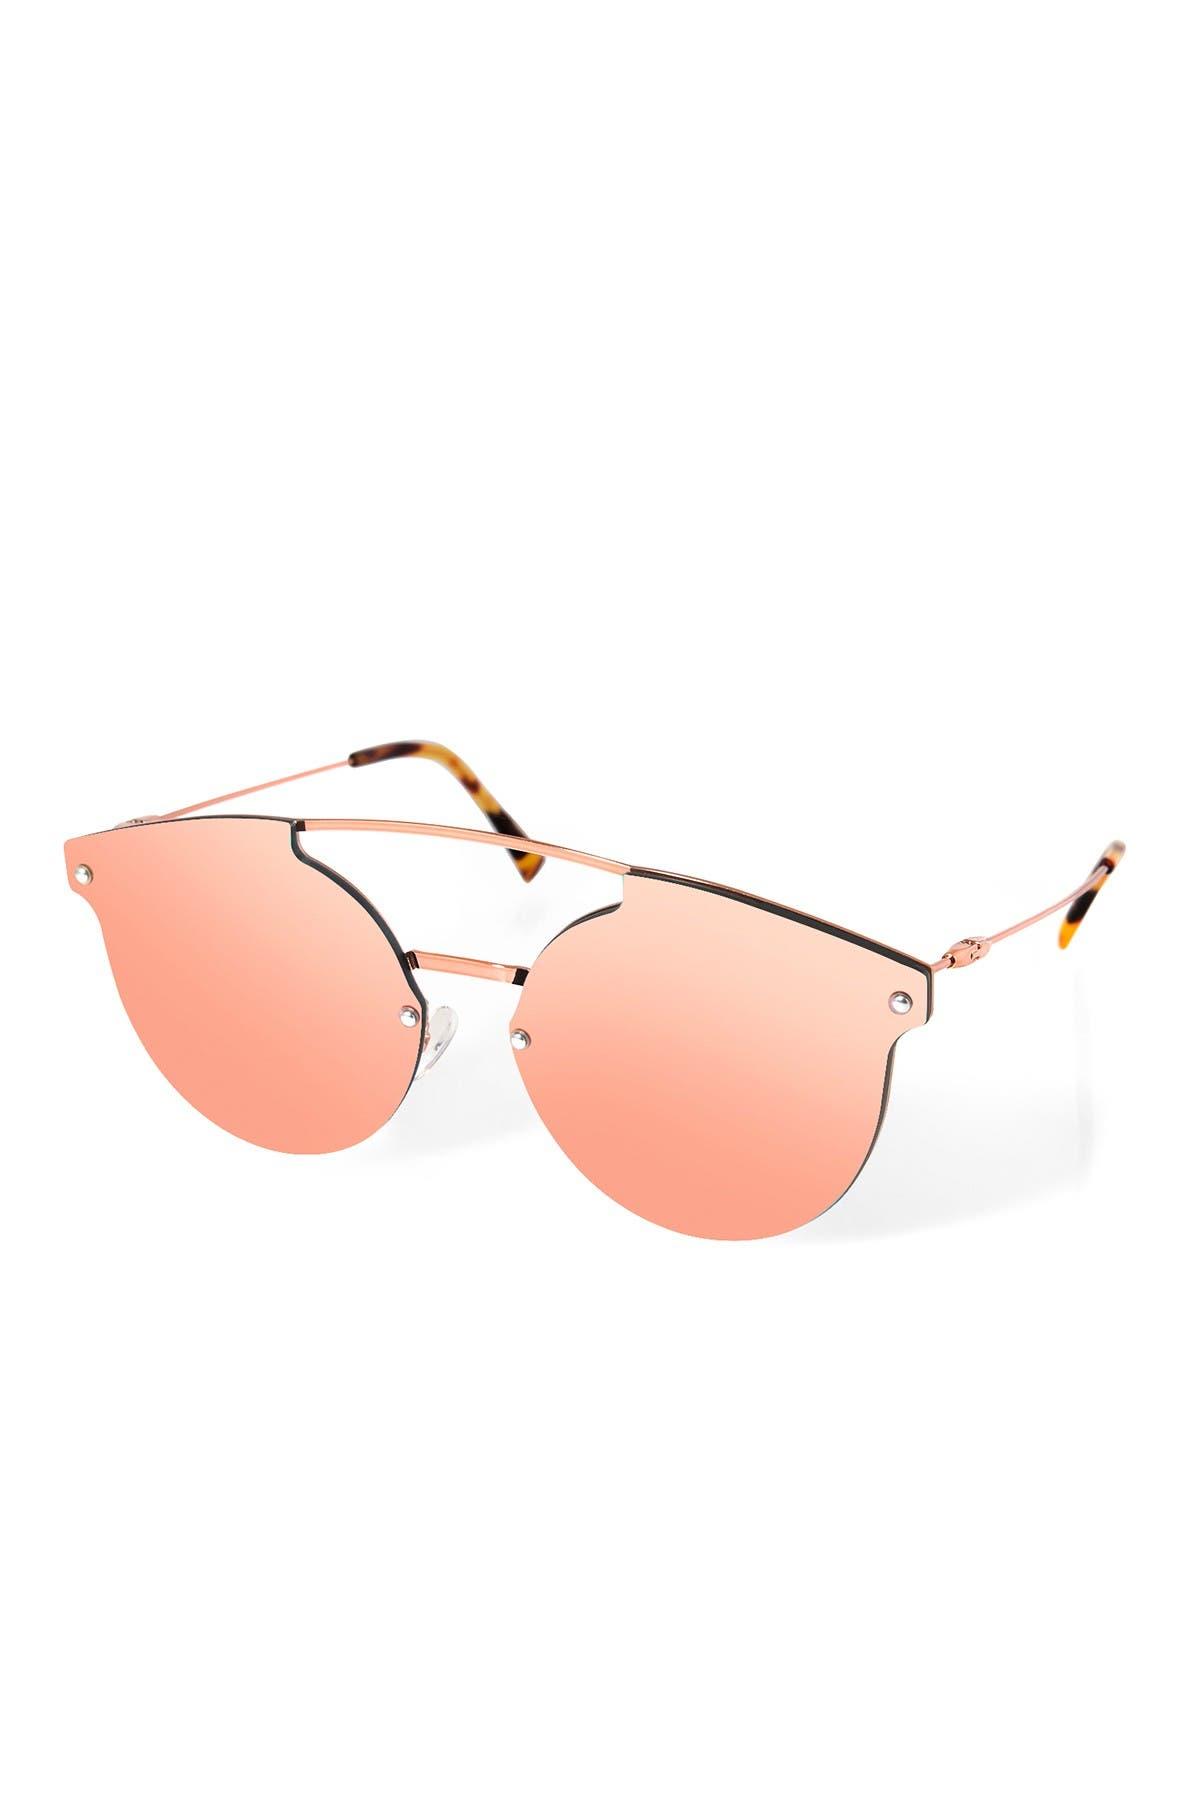 Image of AQS Willow Aviator Sunglasses